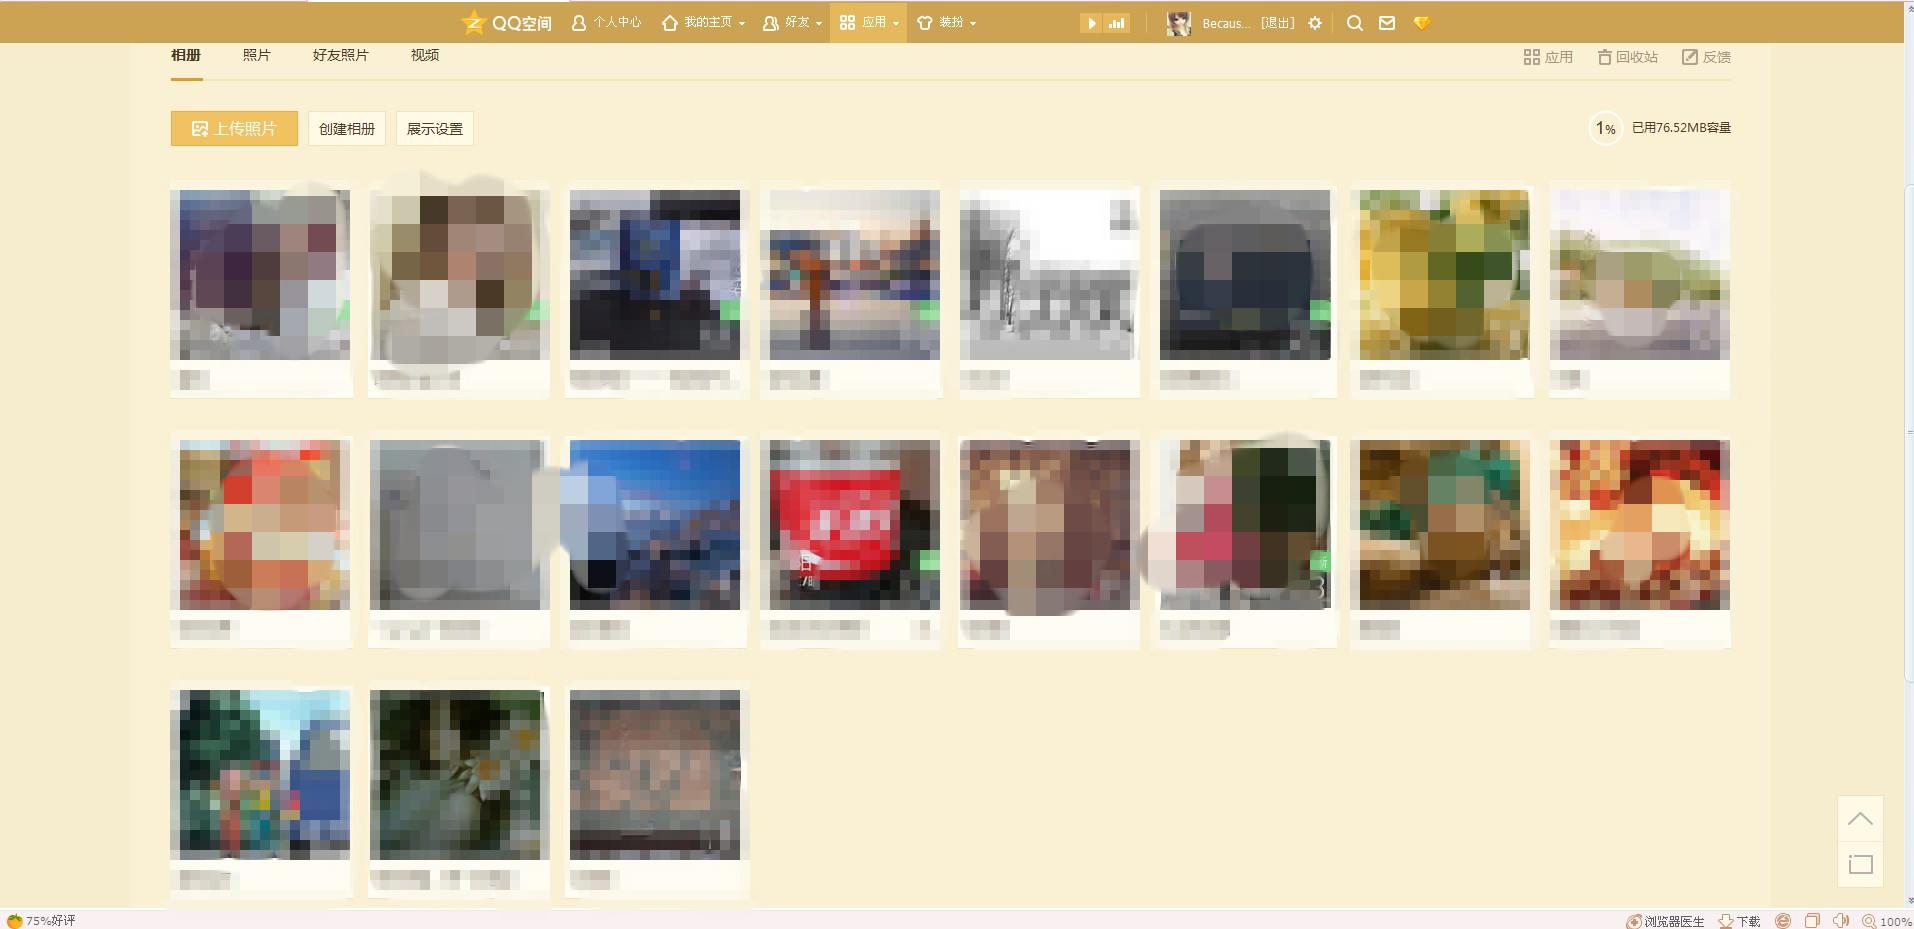 qq相册的高清图_qq空间永久封闭,关键我的相册里的照片,对我很珍贵,能